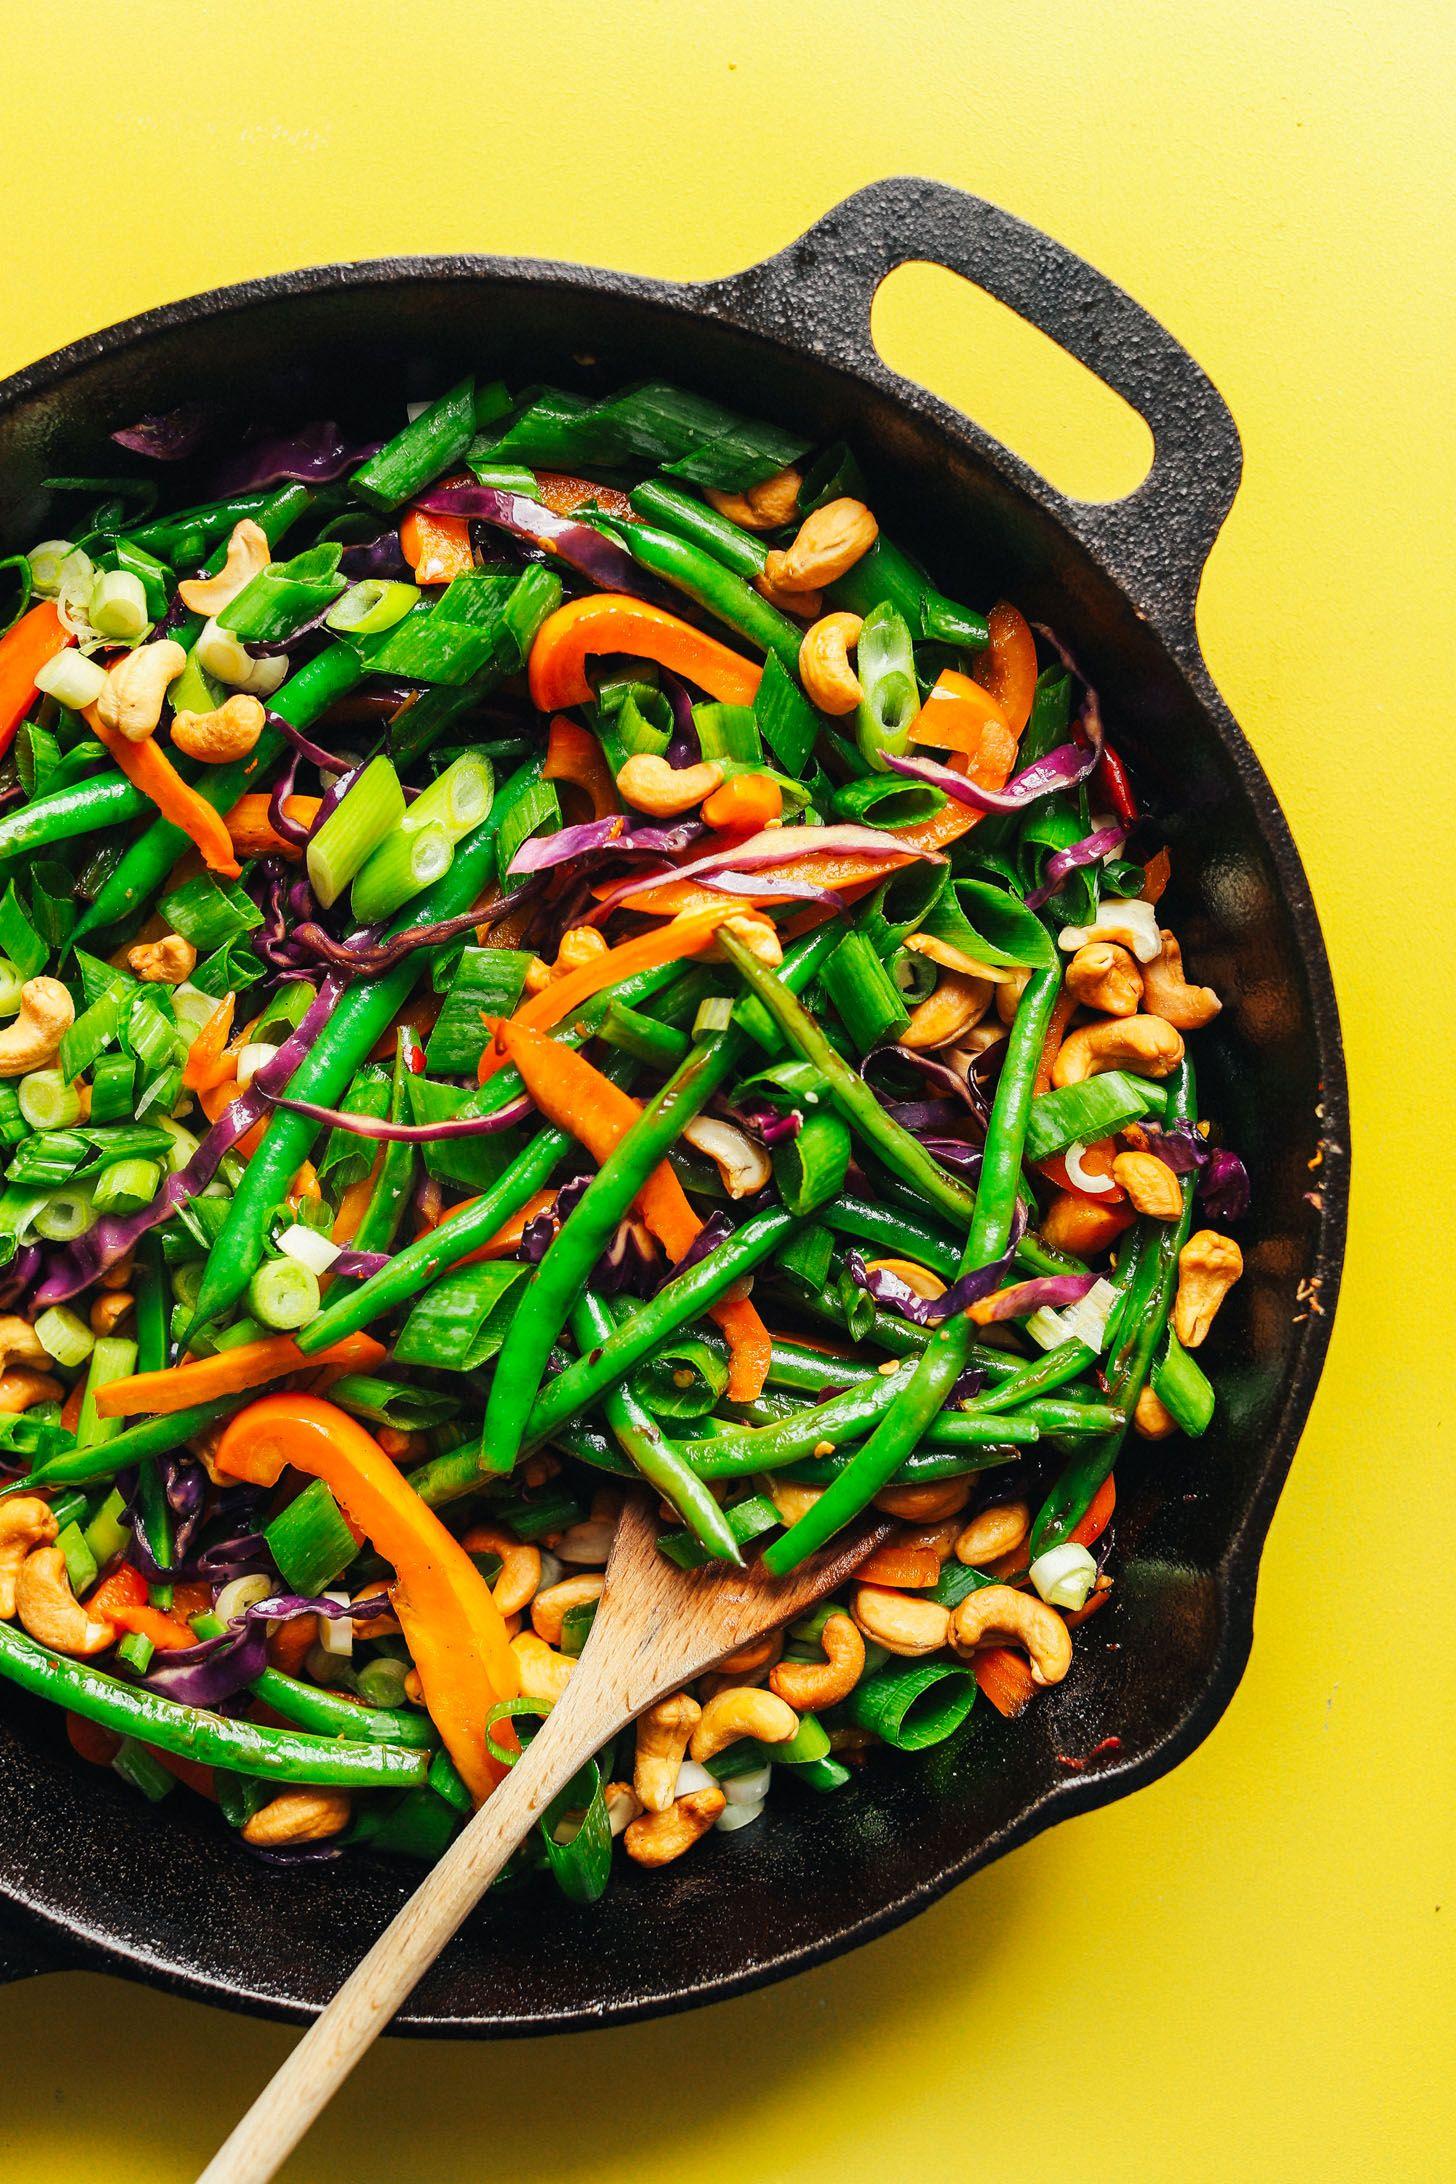 30 Minute Cauliflower Rice Stir Fry Minimalist Baker Recipes Recipe Cauliflower Rice Stir Fry Cauliflower Rice Stir Fry